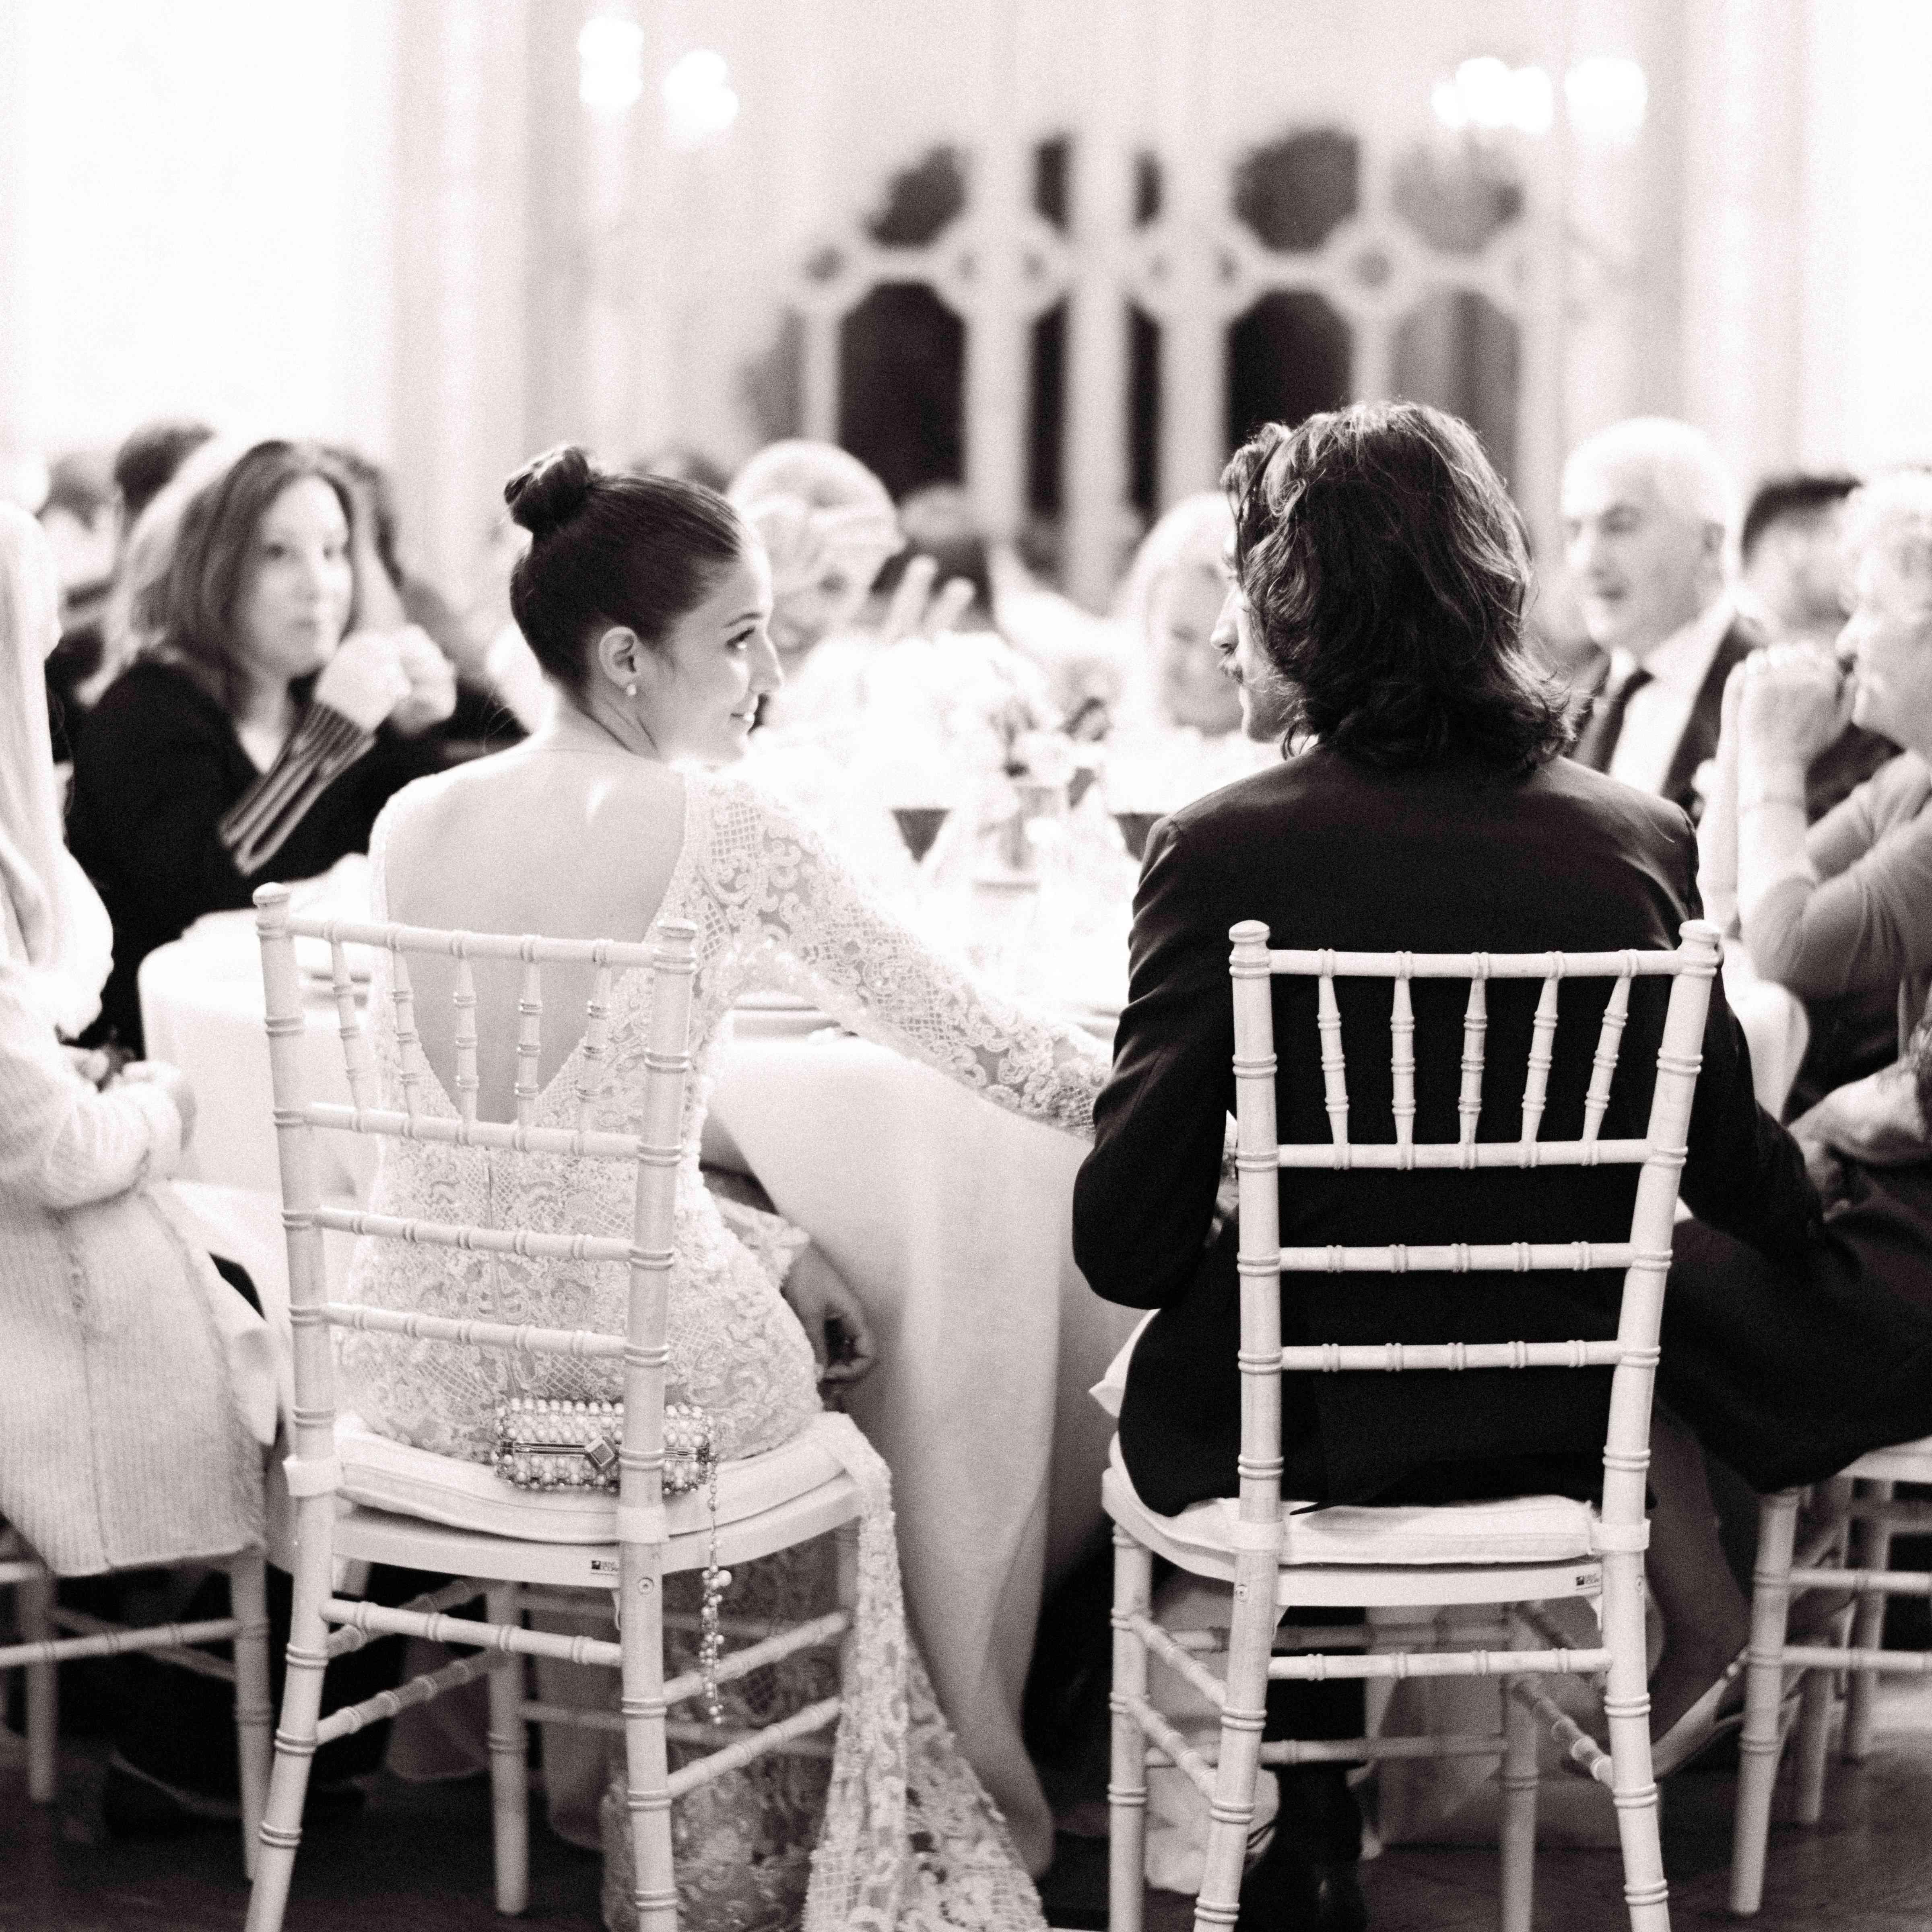 Northern Italian Wedding, Bride and Groom at Reception